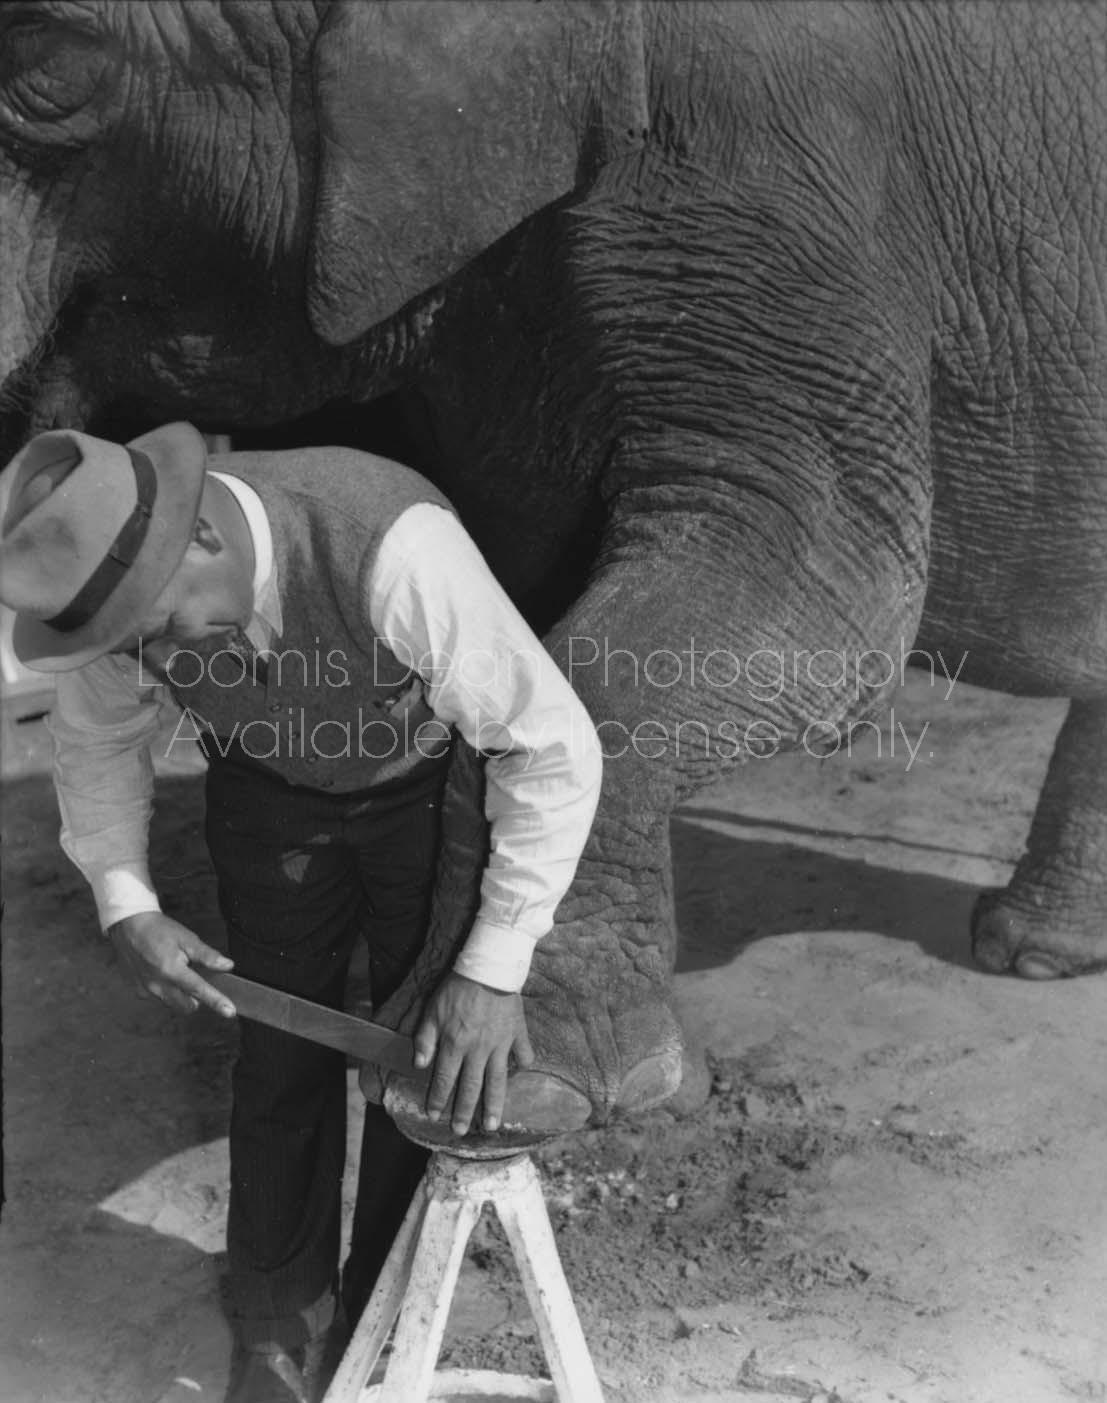 RINGLING CIRCUS ELEPHANT PEDICURE